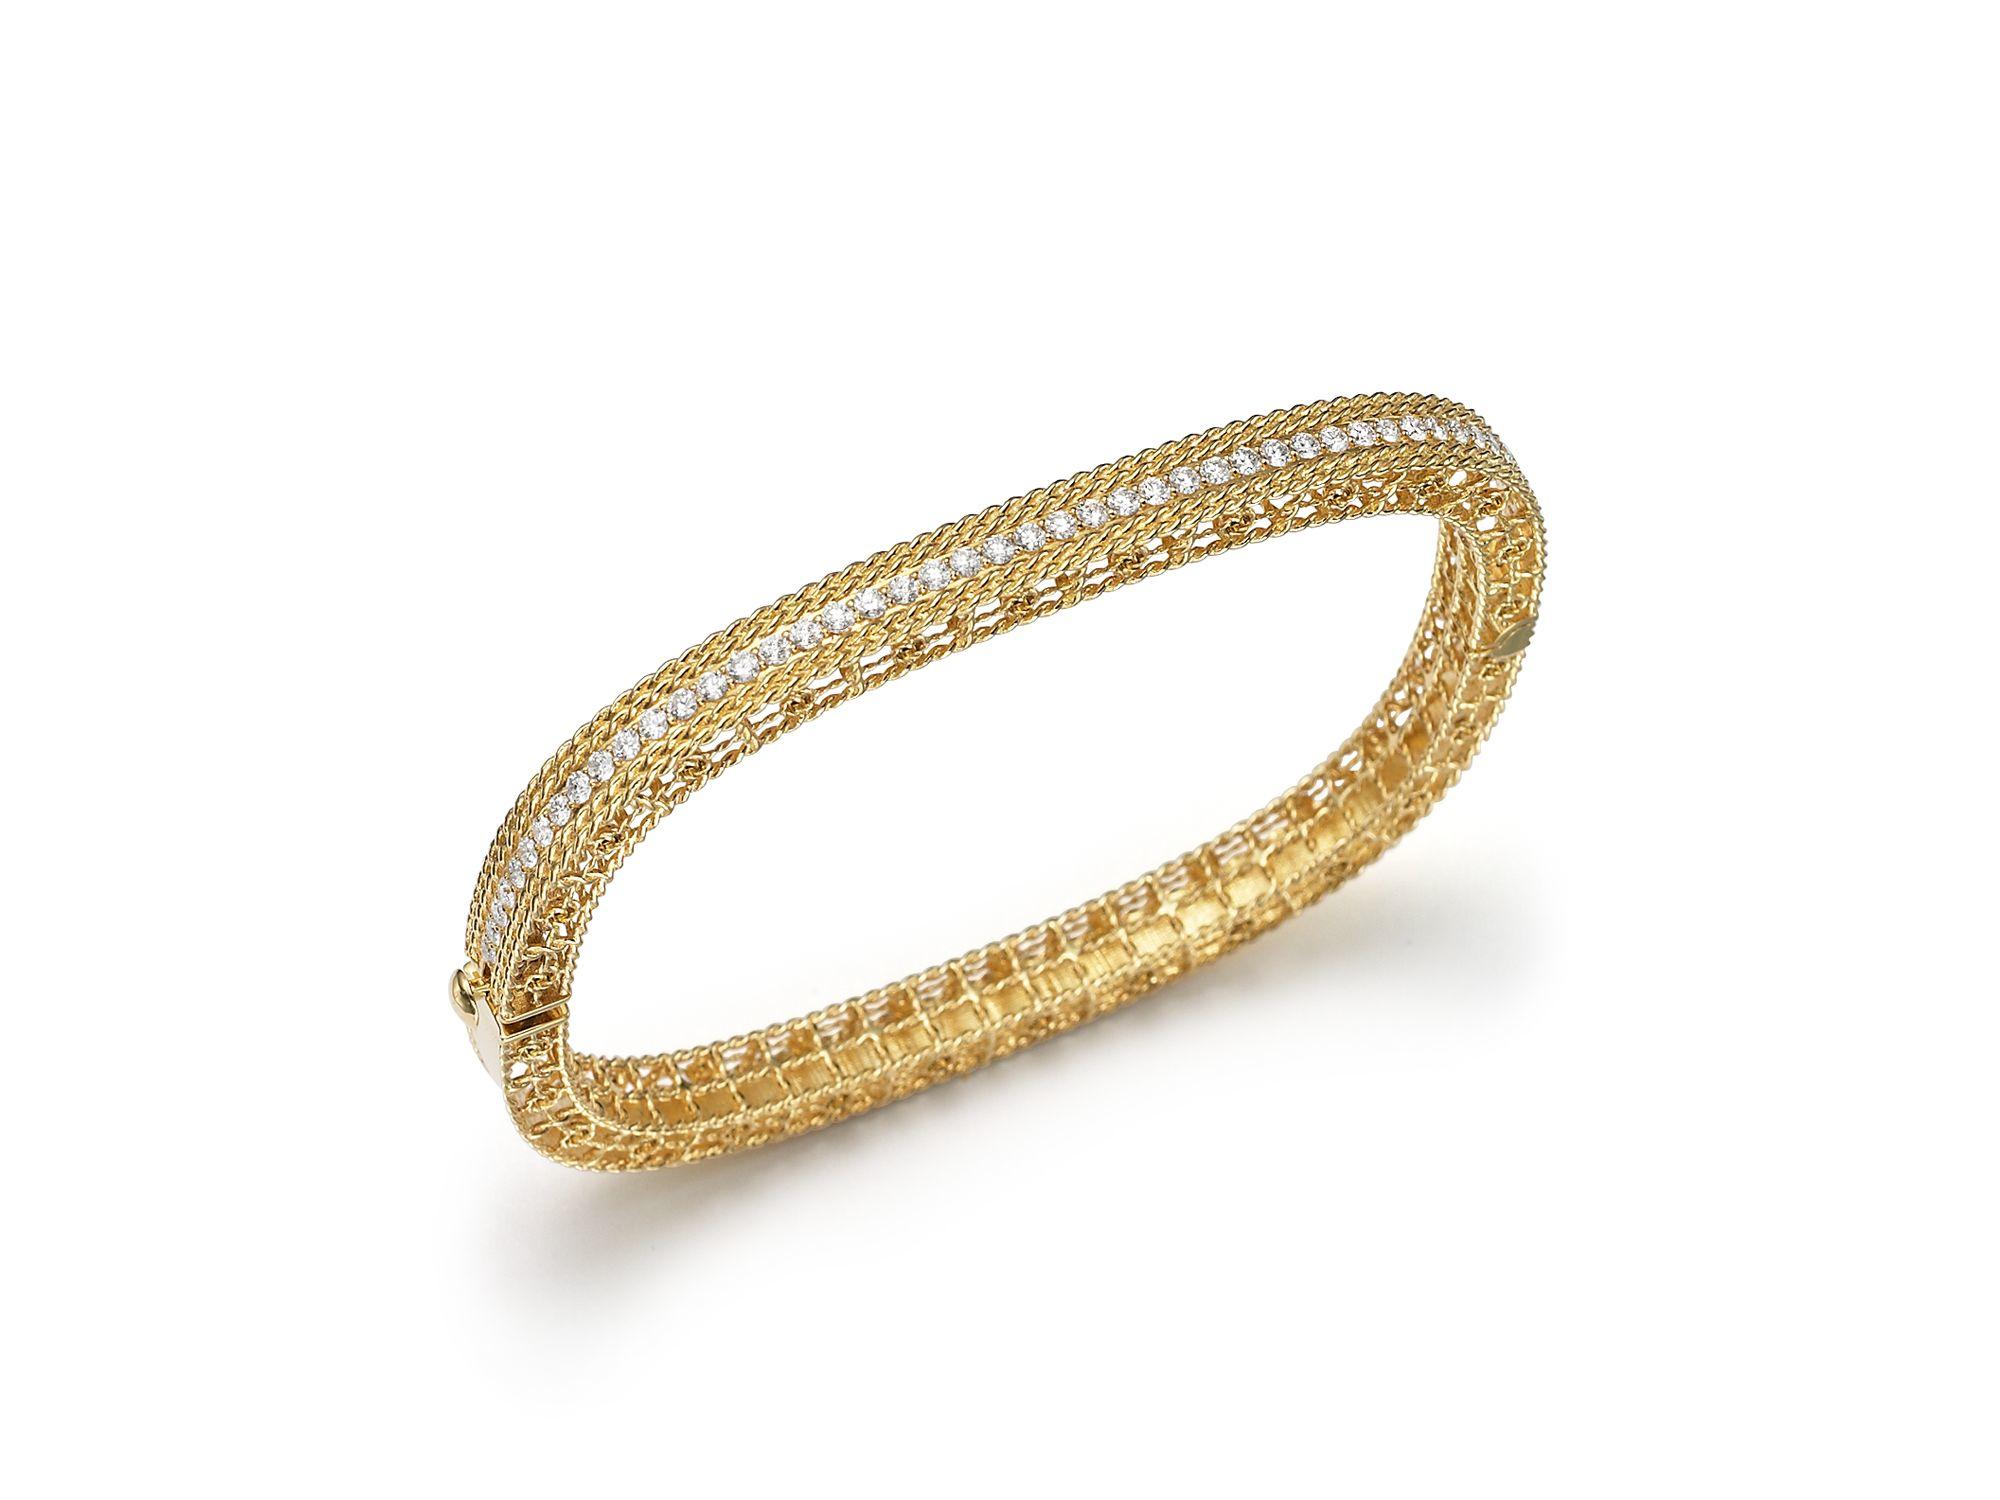 Roberto Coin Hinged 18K Gold Bangle Bracelet Rb5ryeZjg